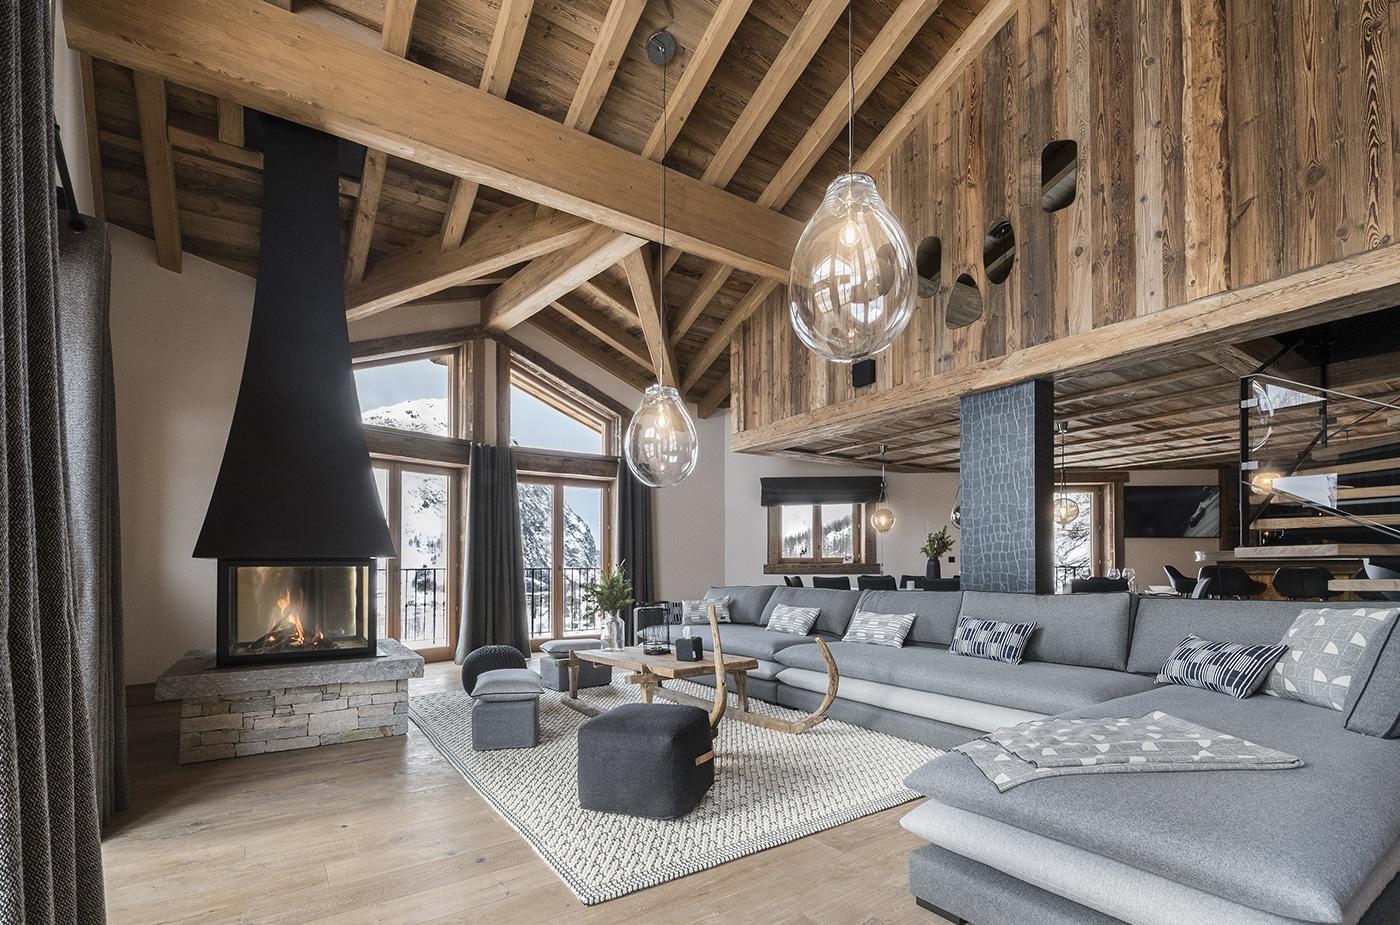 chalet-ovalala-val-disere-living-room-cheminee